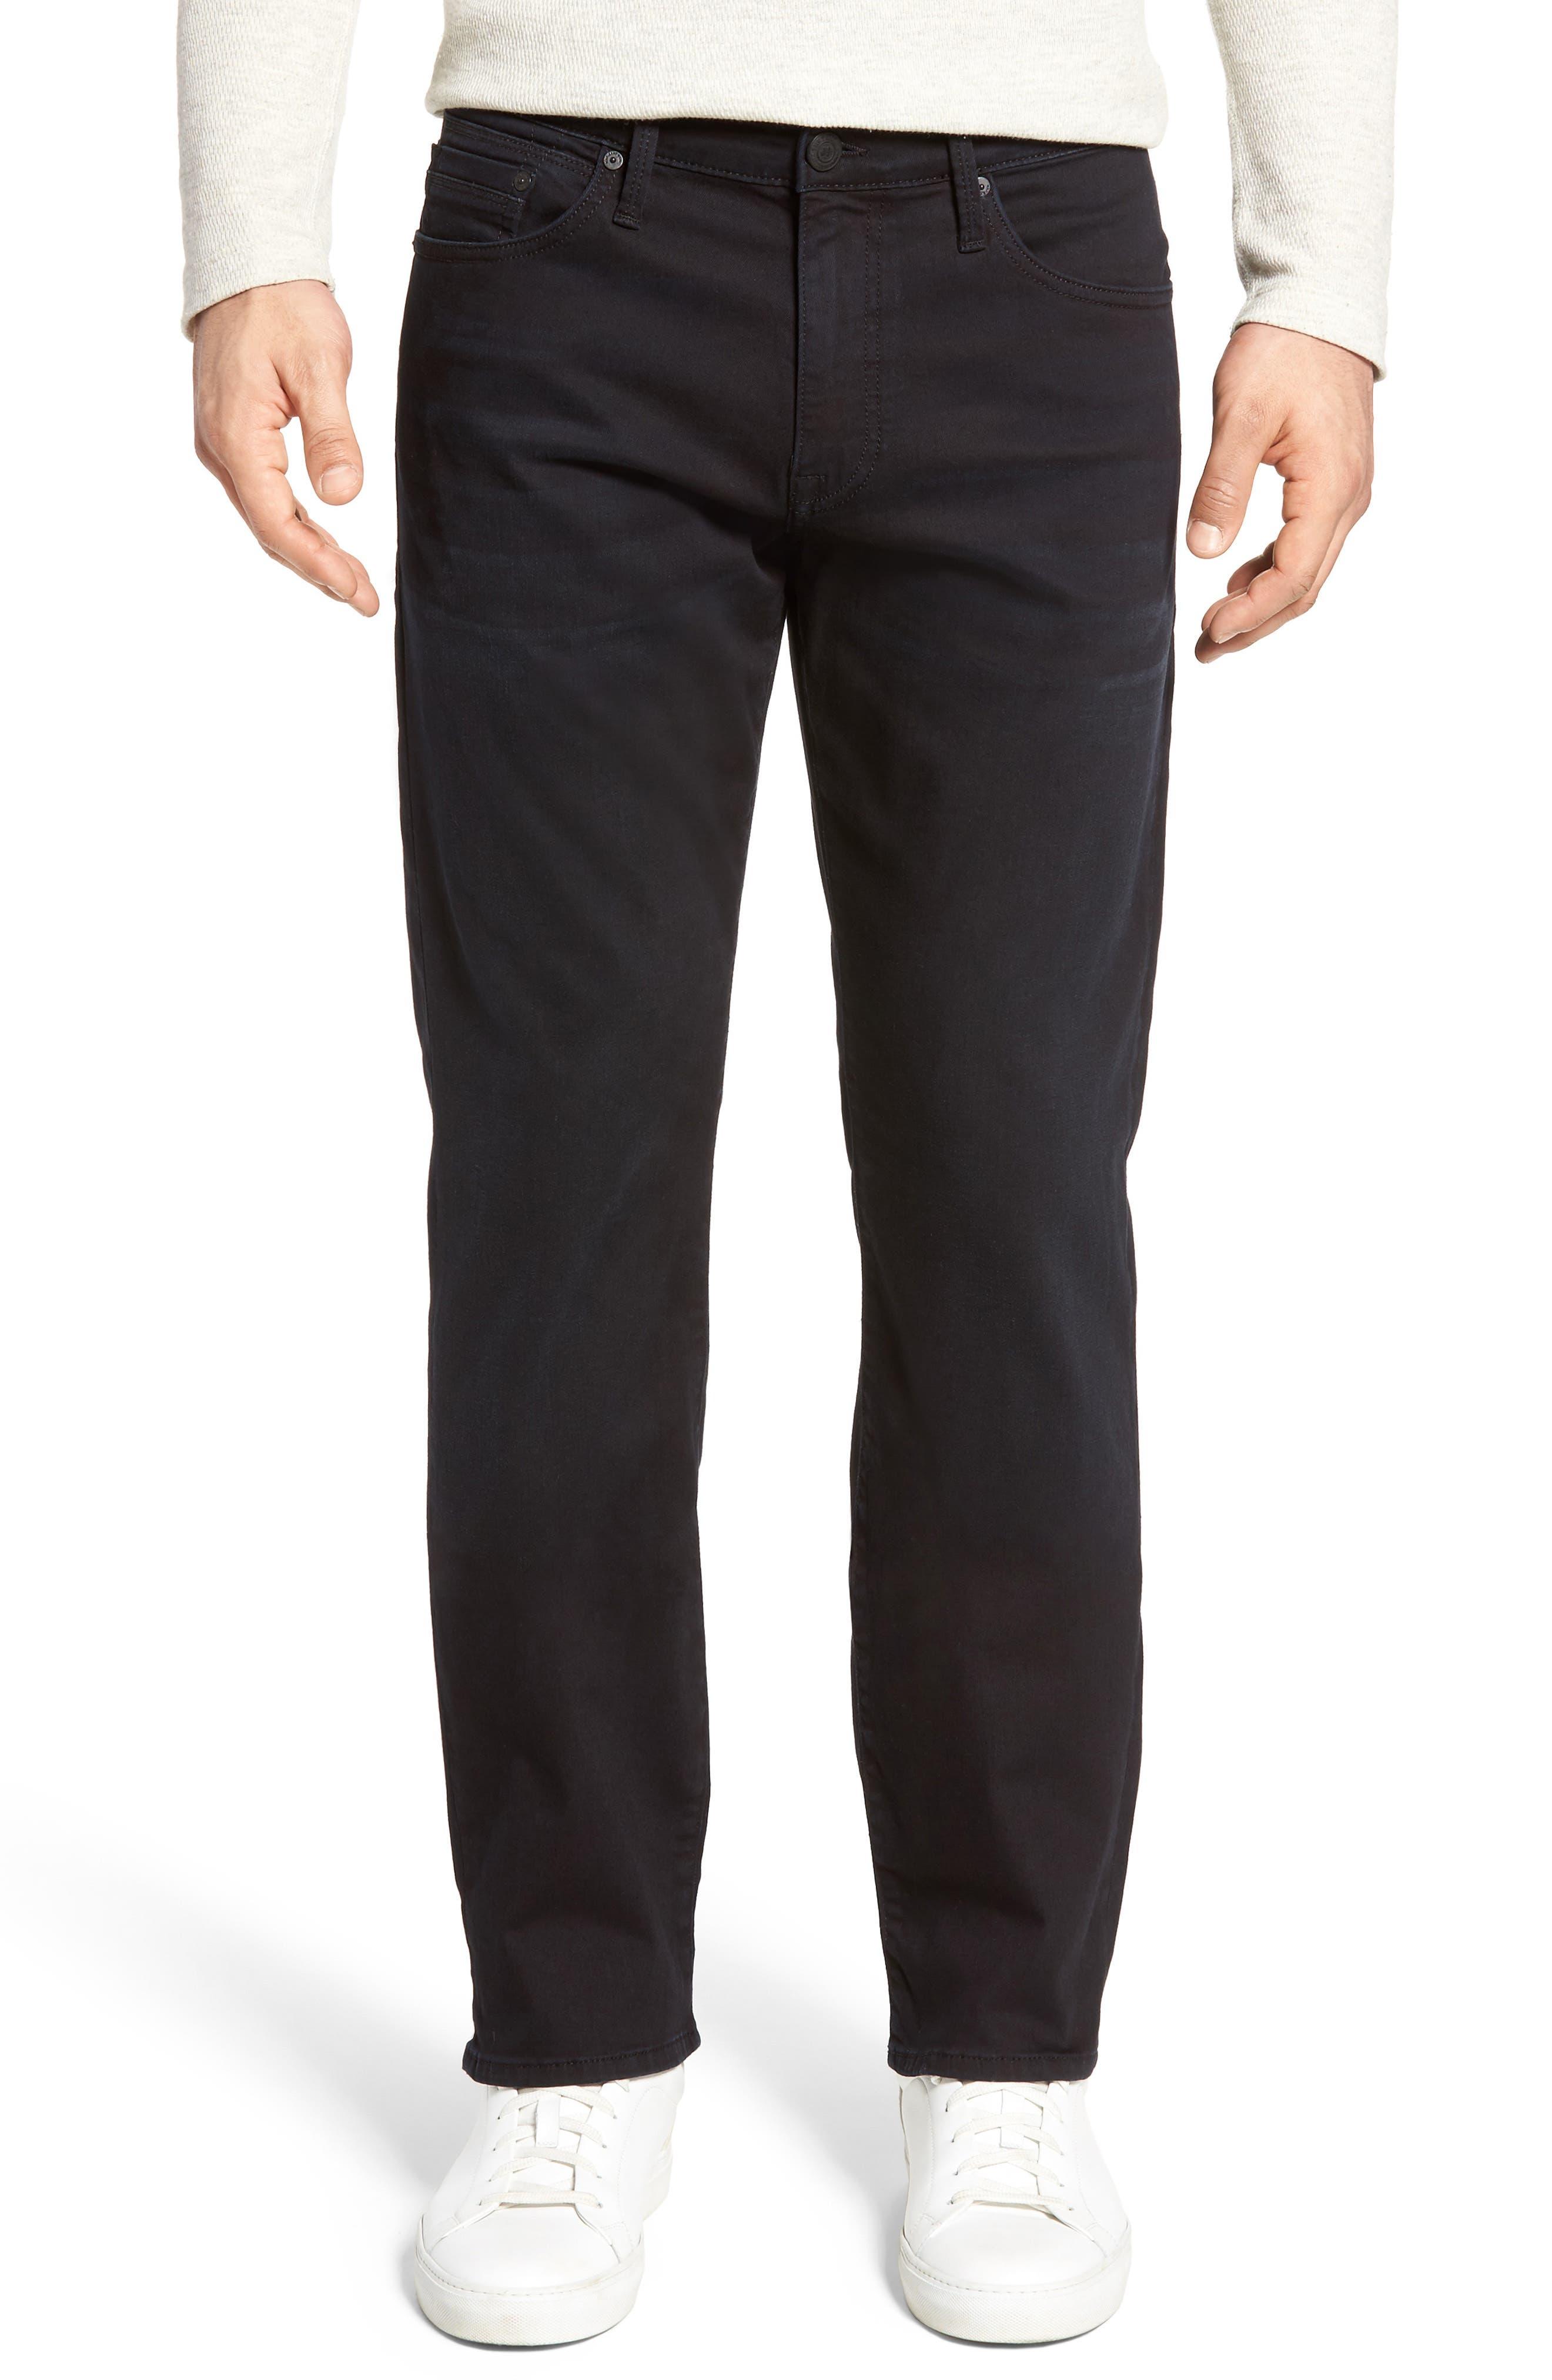 Matt Relaxed Fit Jeans,                         Main,                         color, Blue Black